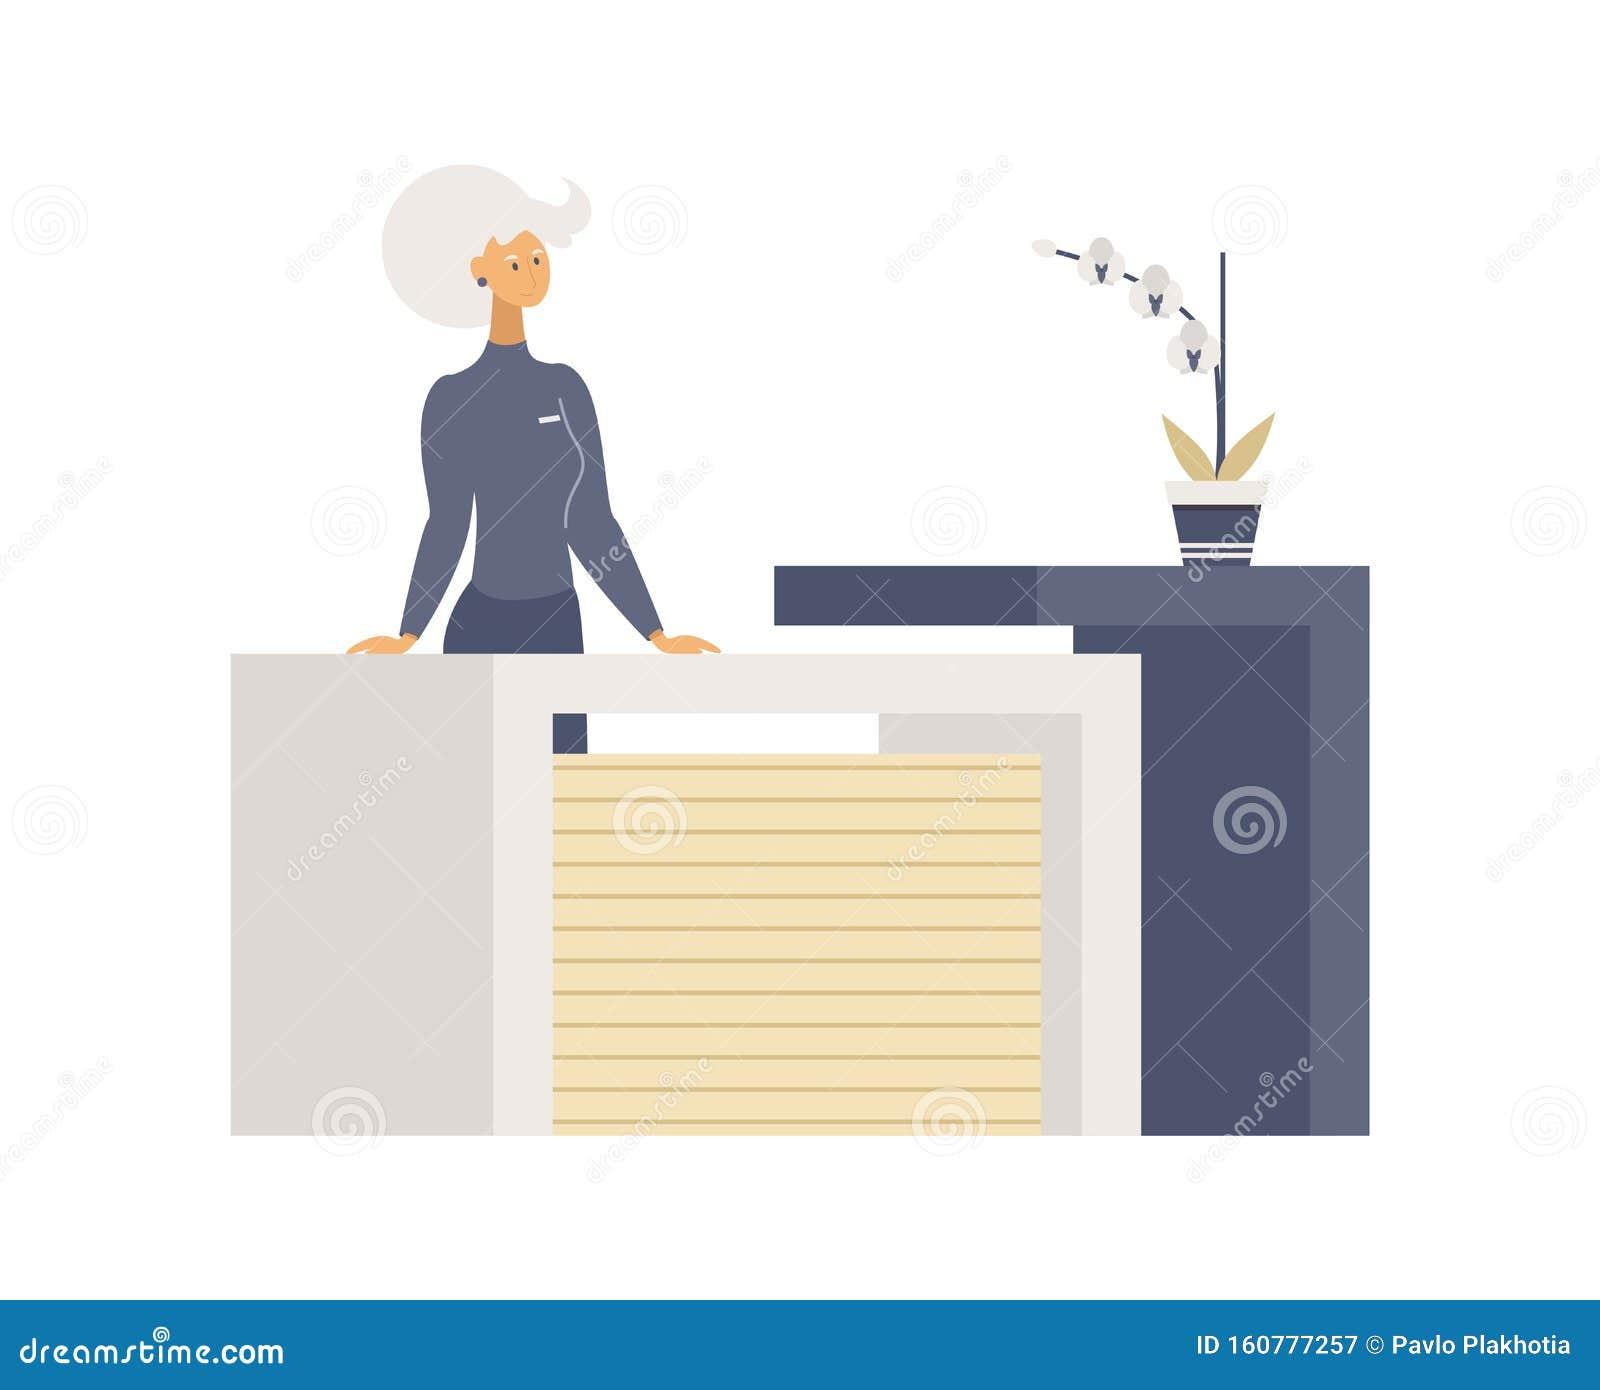 Cartoon Receptionist Stock Illustrations 1 777 Cartoon Receptionist Stock Illustrations Vectors Clipart Dreamstime